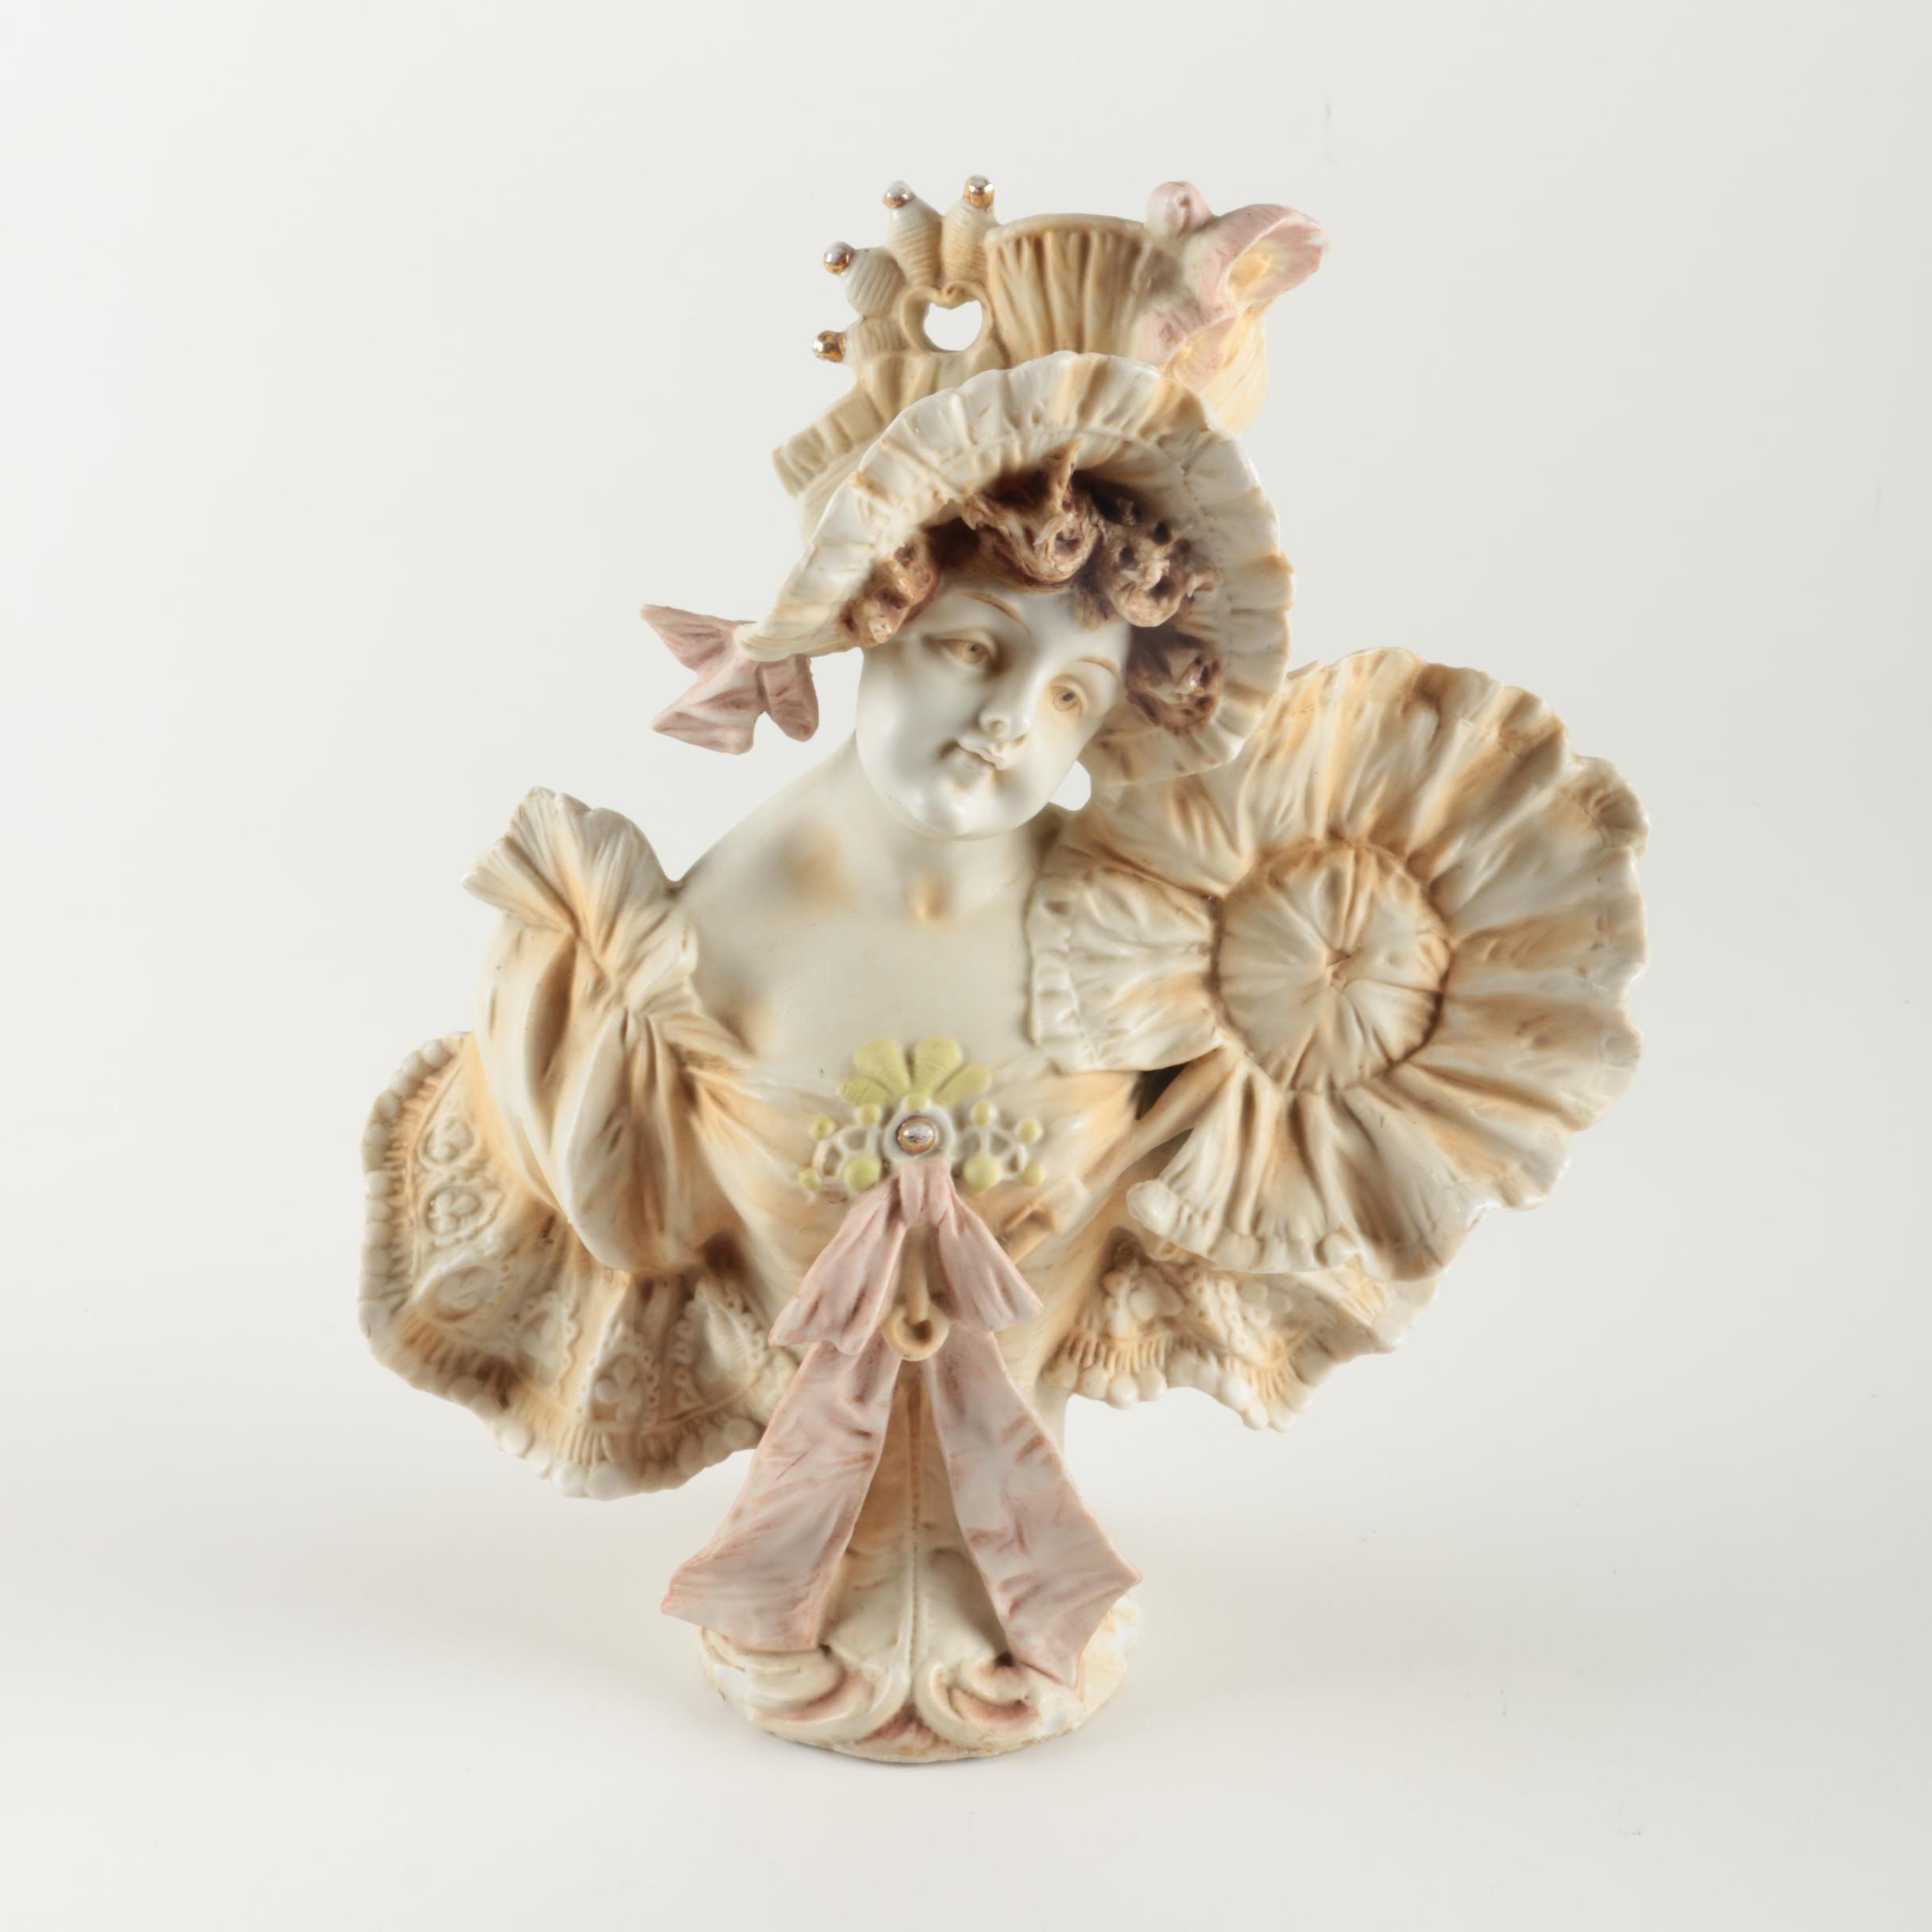 Porcelain Bust of a Woman